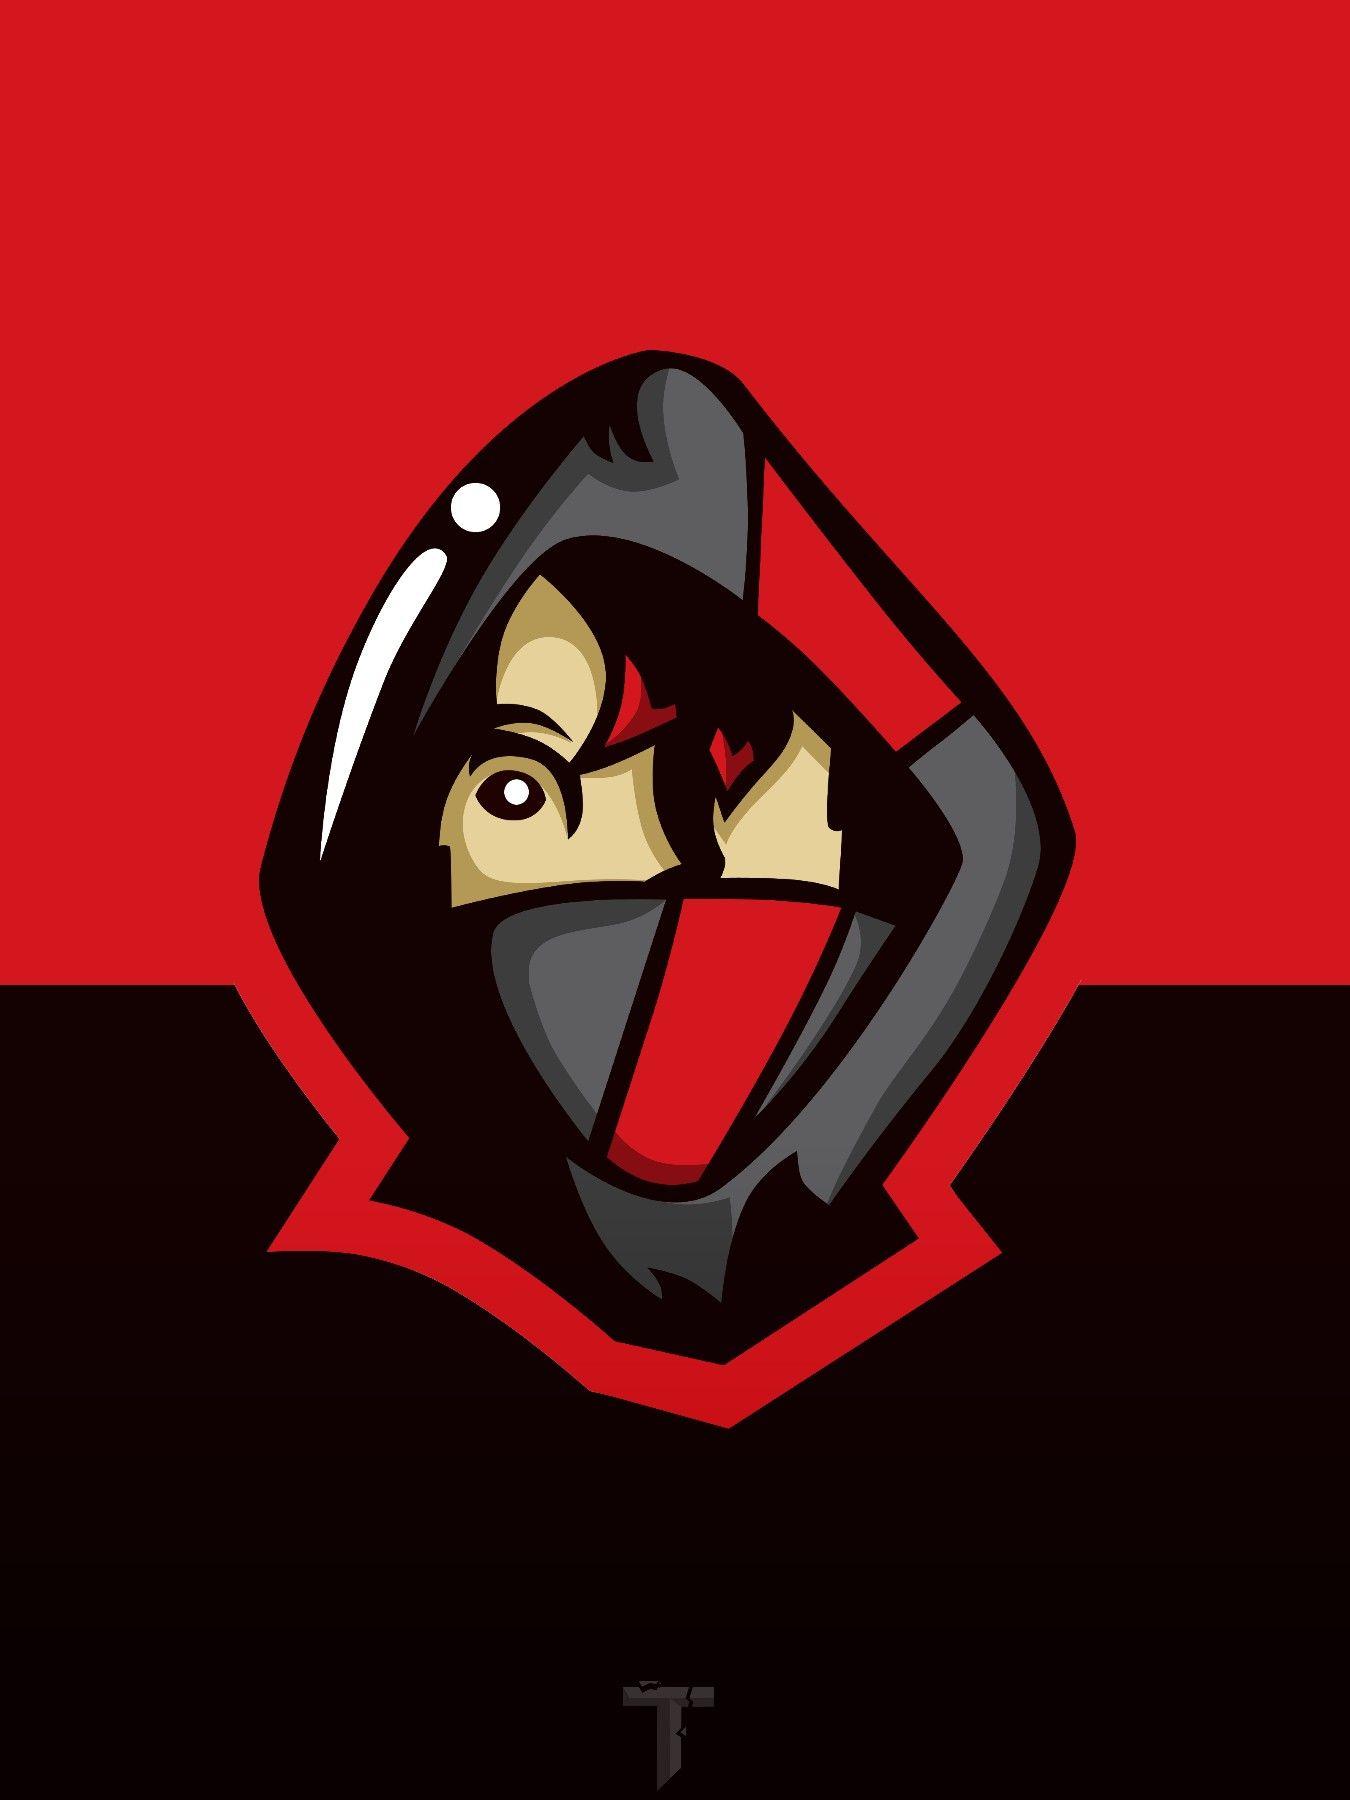 Ikonik Skin Mascot Logo Fortnite Battle Royale Epic Games Png Wallpaper Background Skin Logo Logo Background How To Make Logo